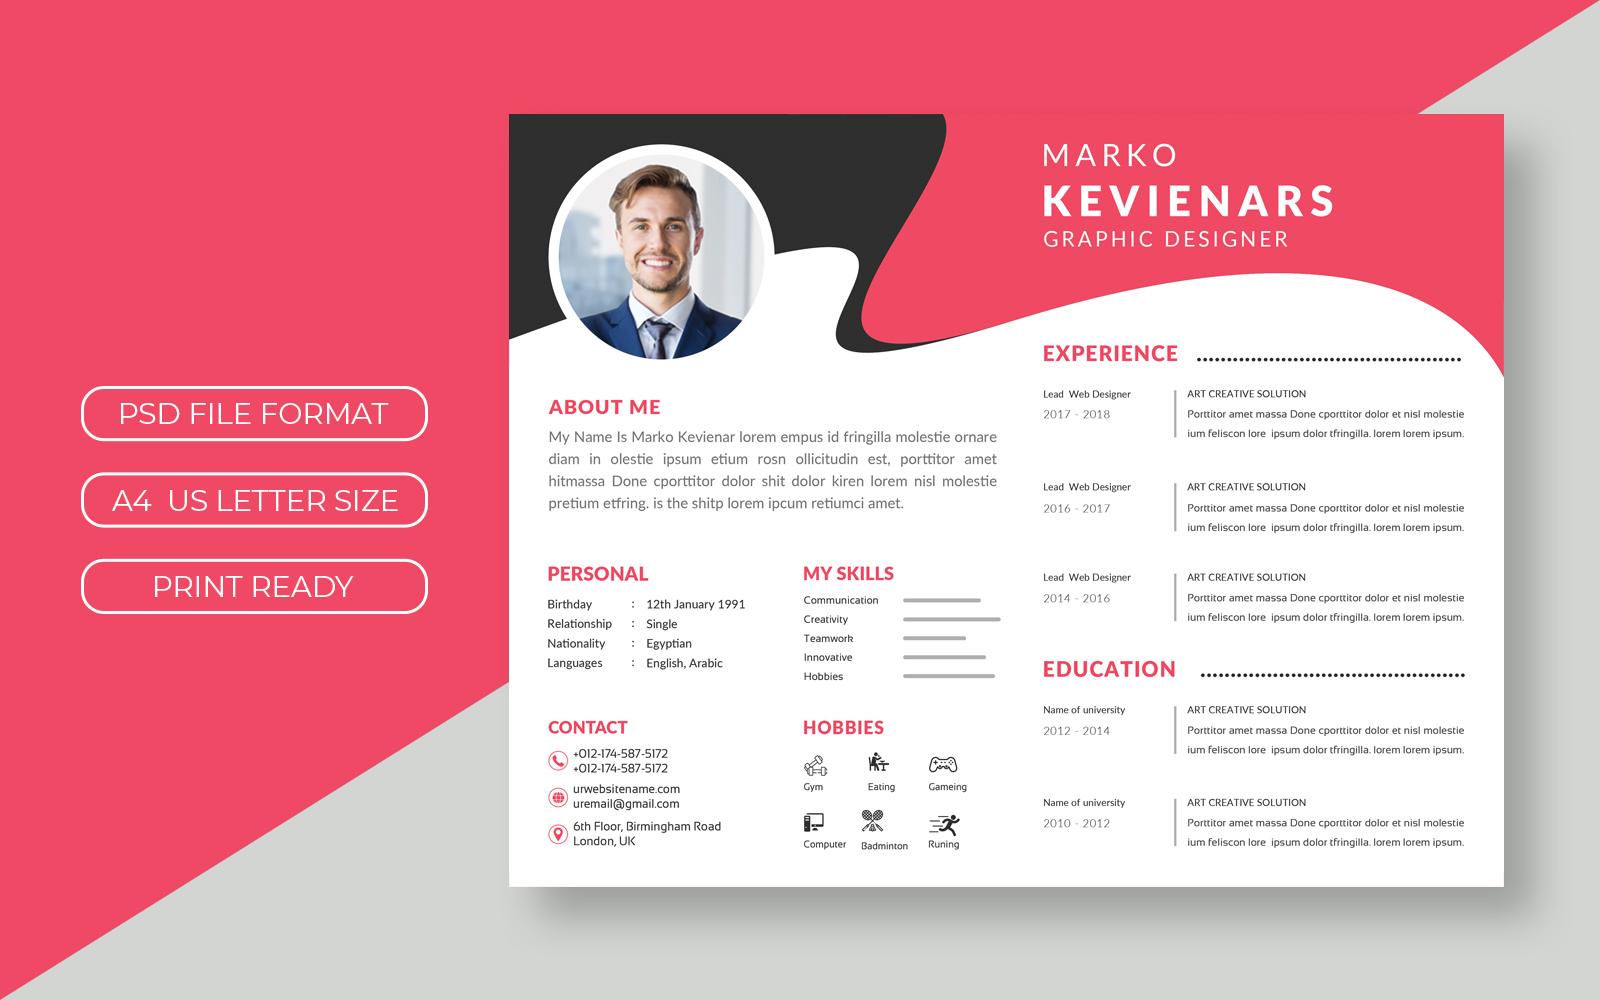 Marko Kevinenars Curriculum Vitae Theme №157573